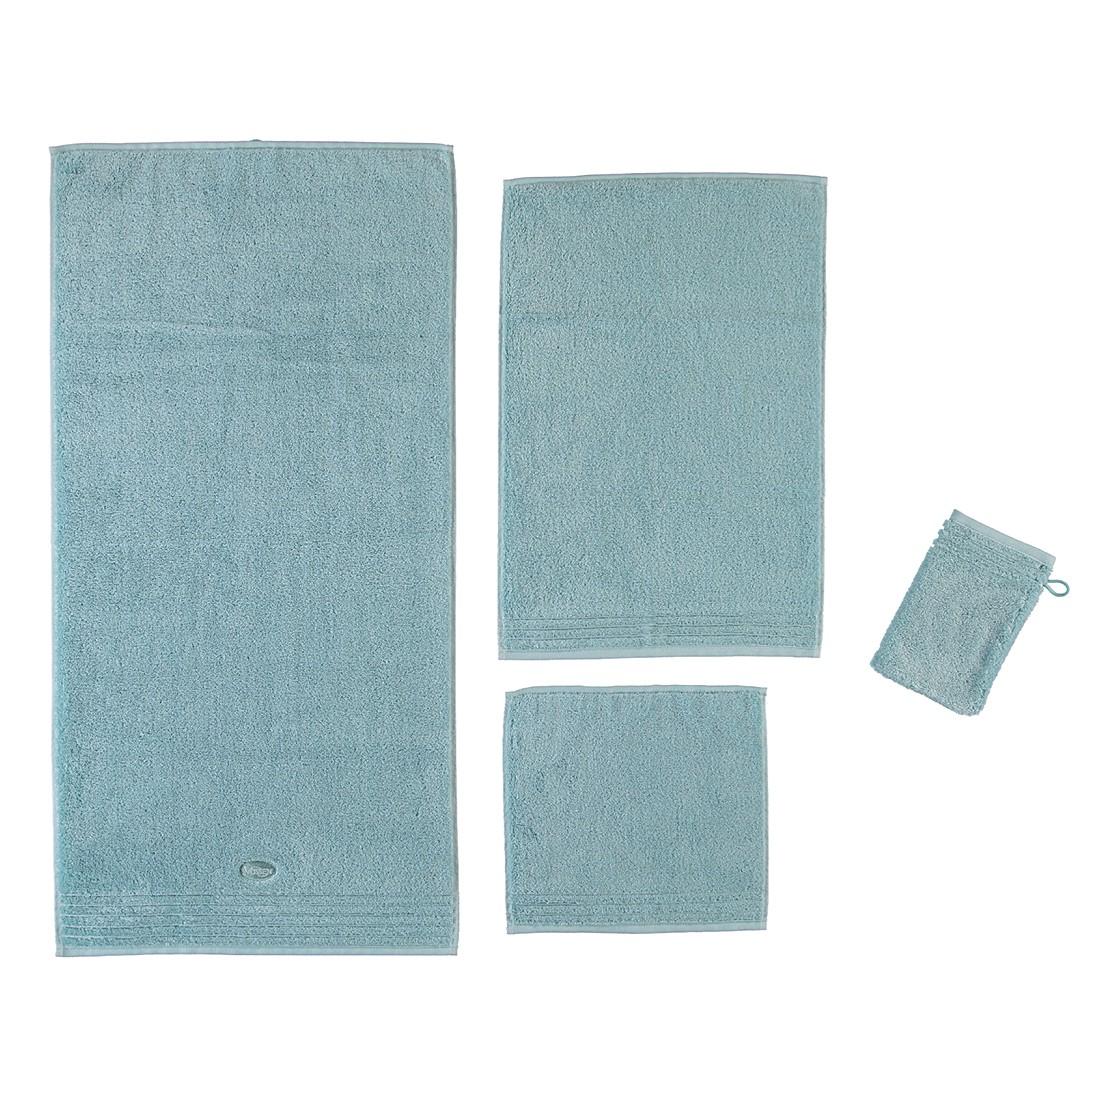 handt cher dreams baumwolle kristallgr n handtuch 60x110 cm vossen g nstig. Black Bedroom Furniture Sets. Home Design Ideas